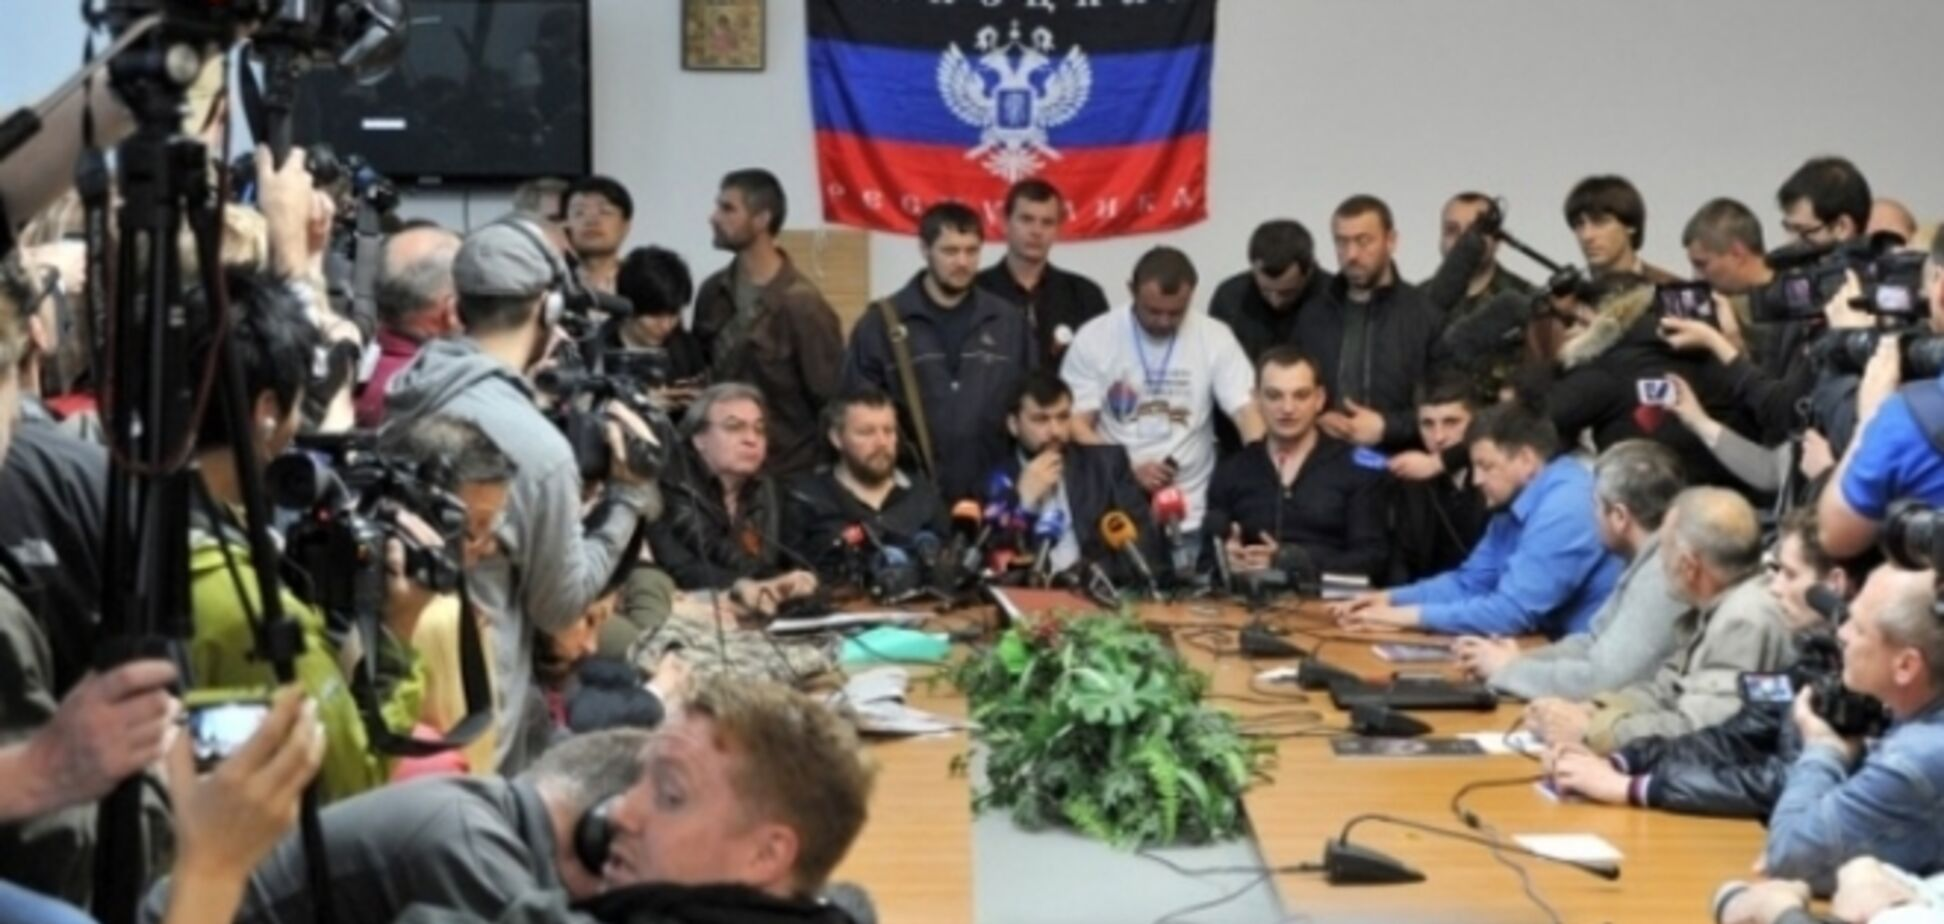 ДНР после заявления о национализации предприятий осталась без 'министра' топлива и энергетики'